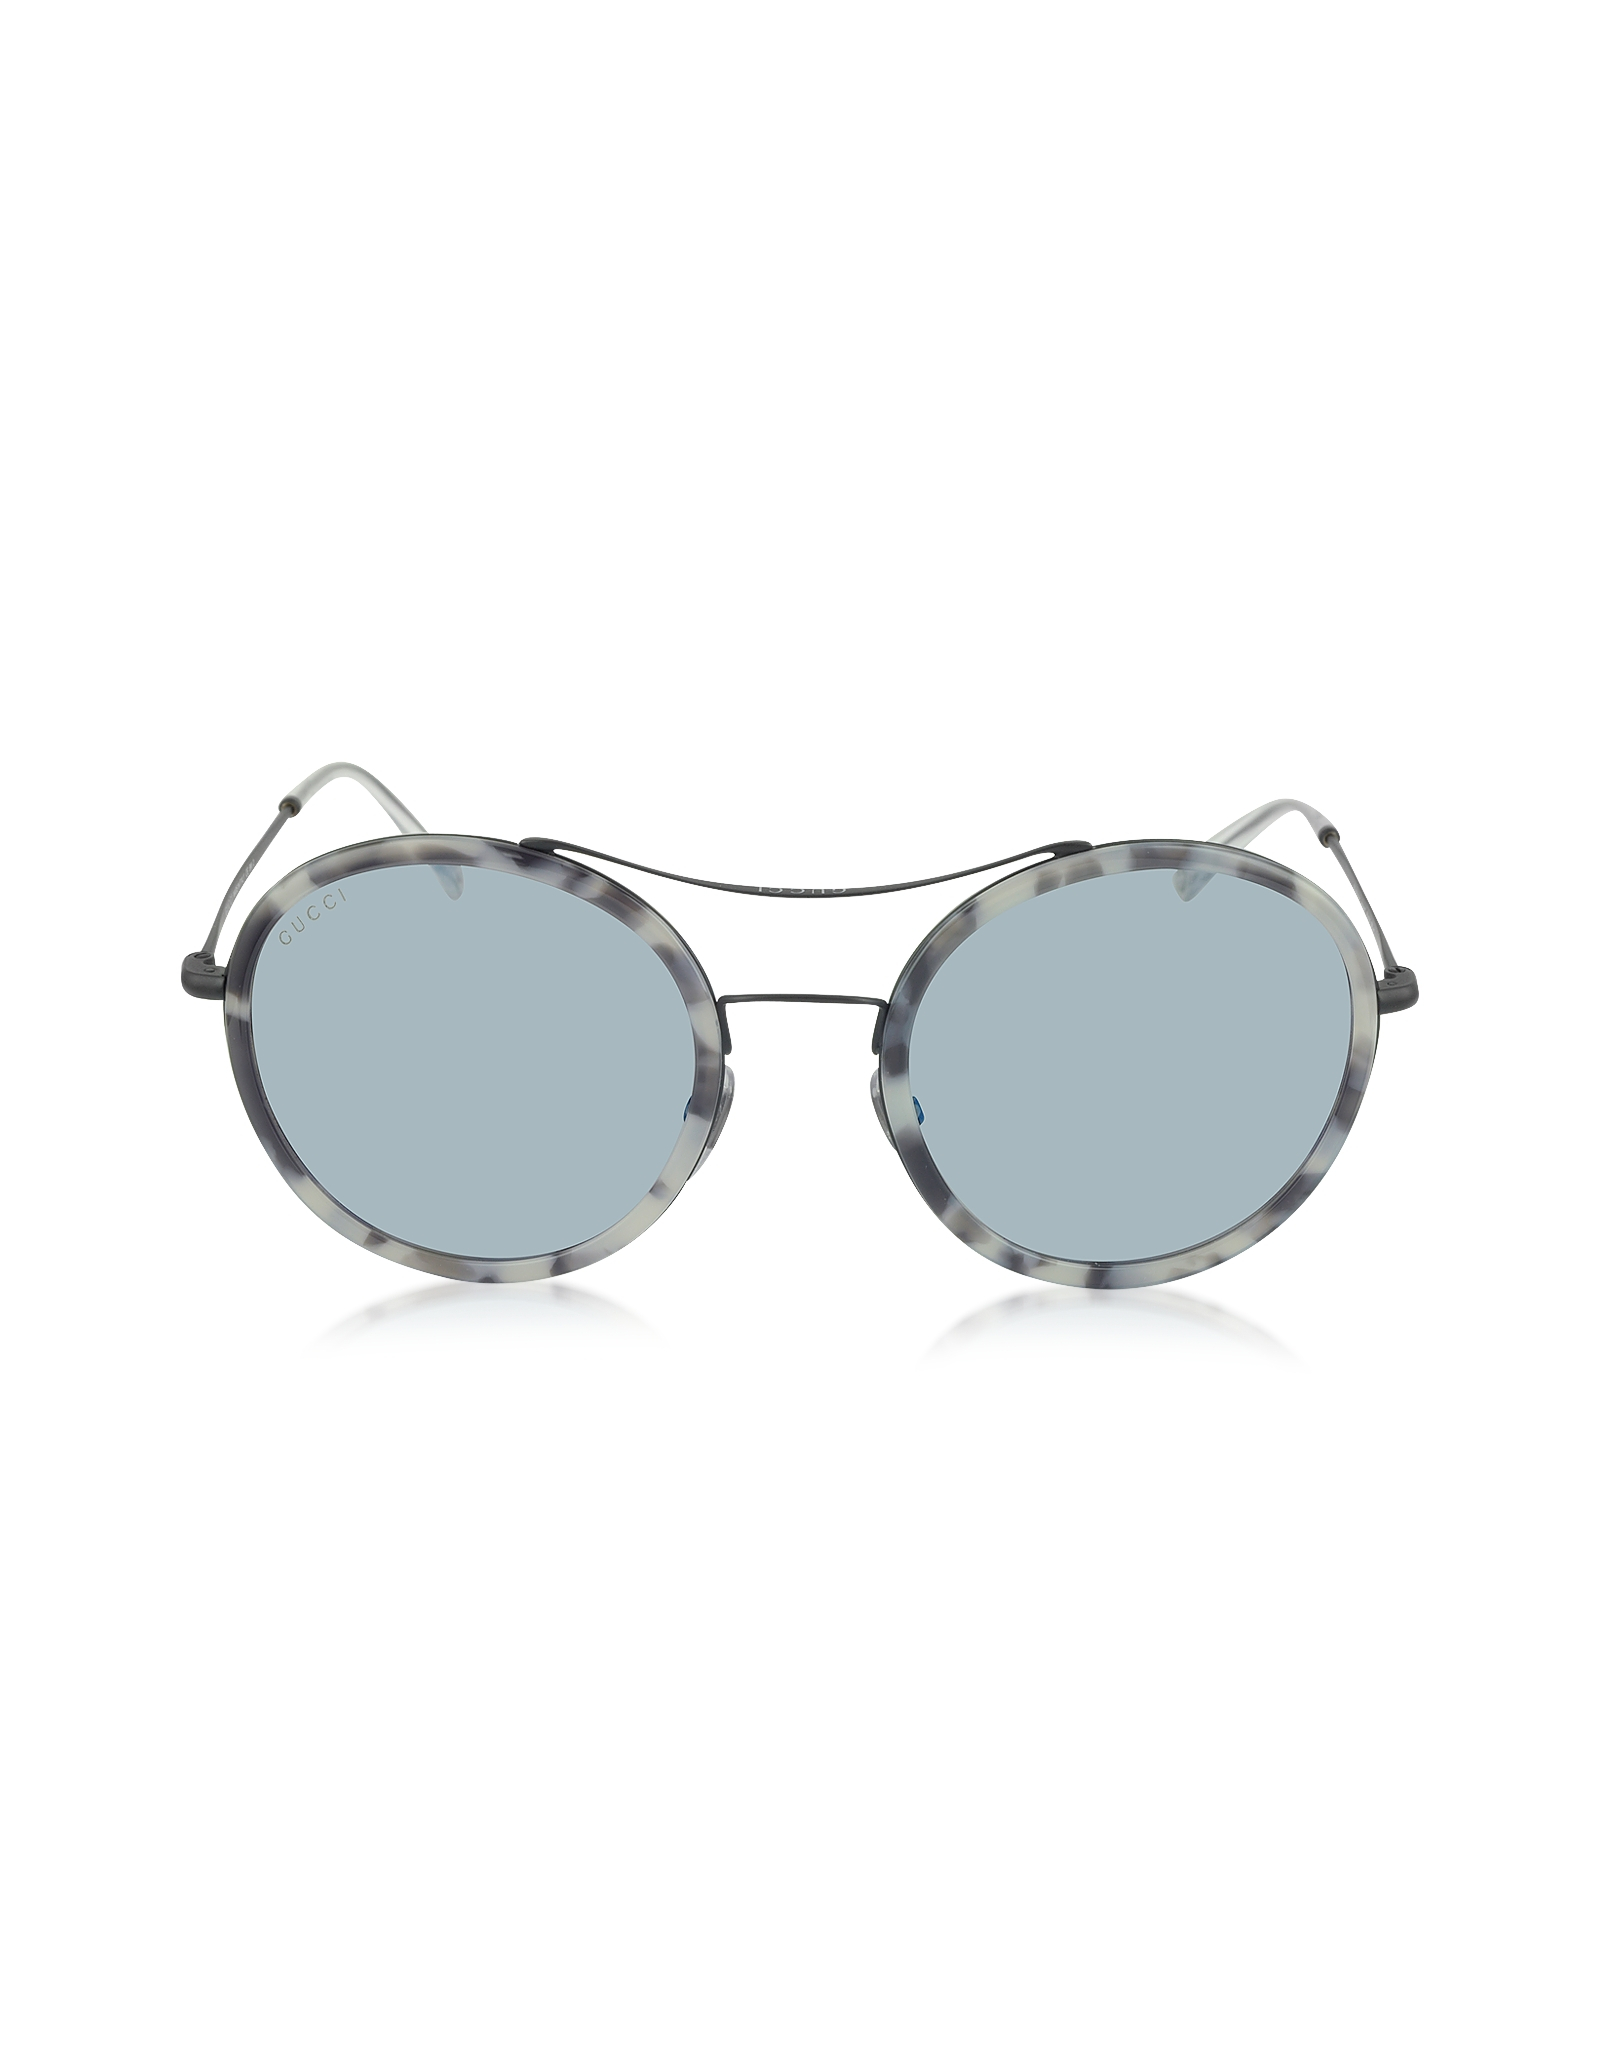 5cc5adc8d6e Lyst - Gucci Gg 4252 n s Ultra Light Acetate Round Women Sunglasses ...